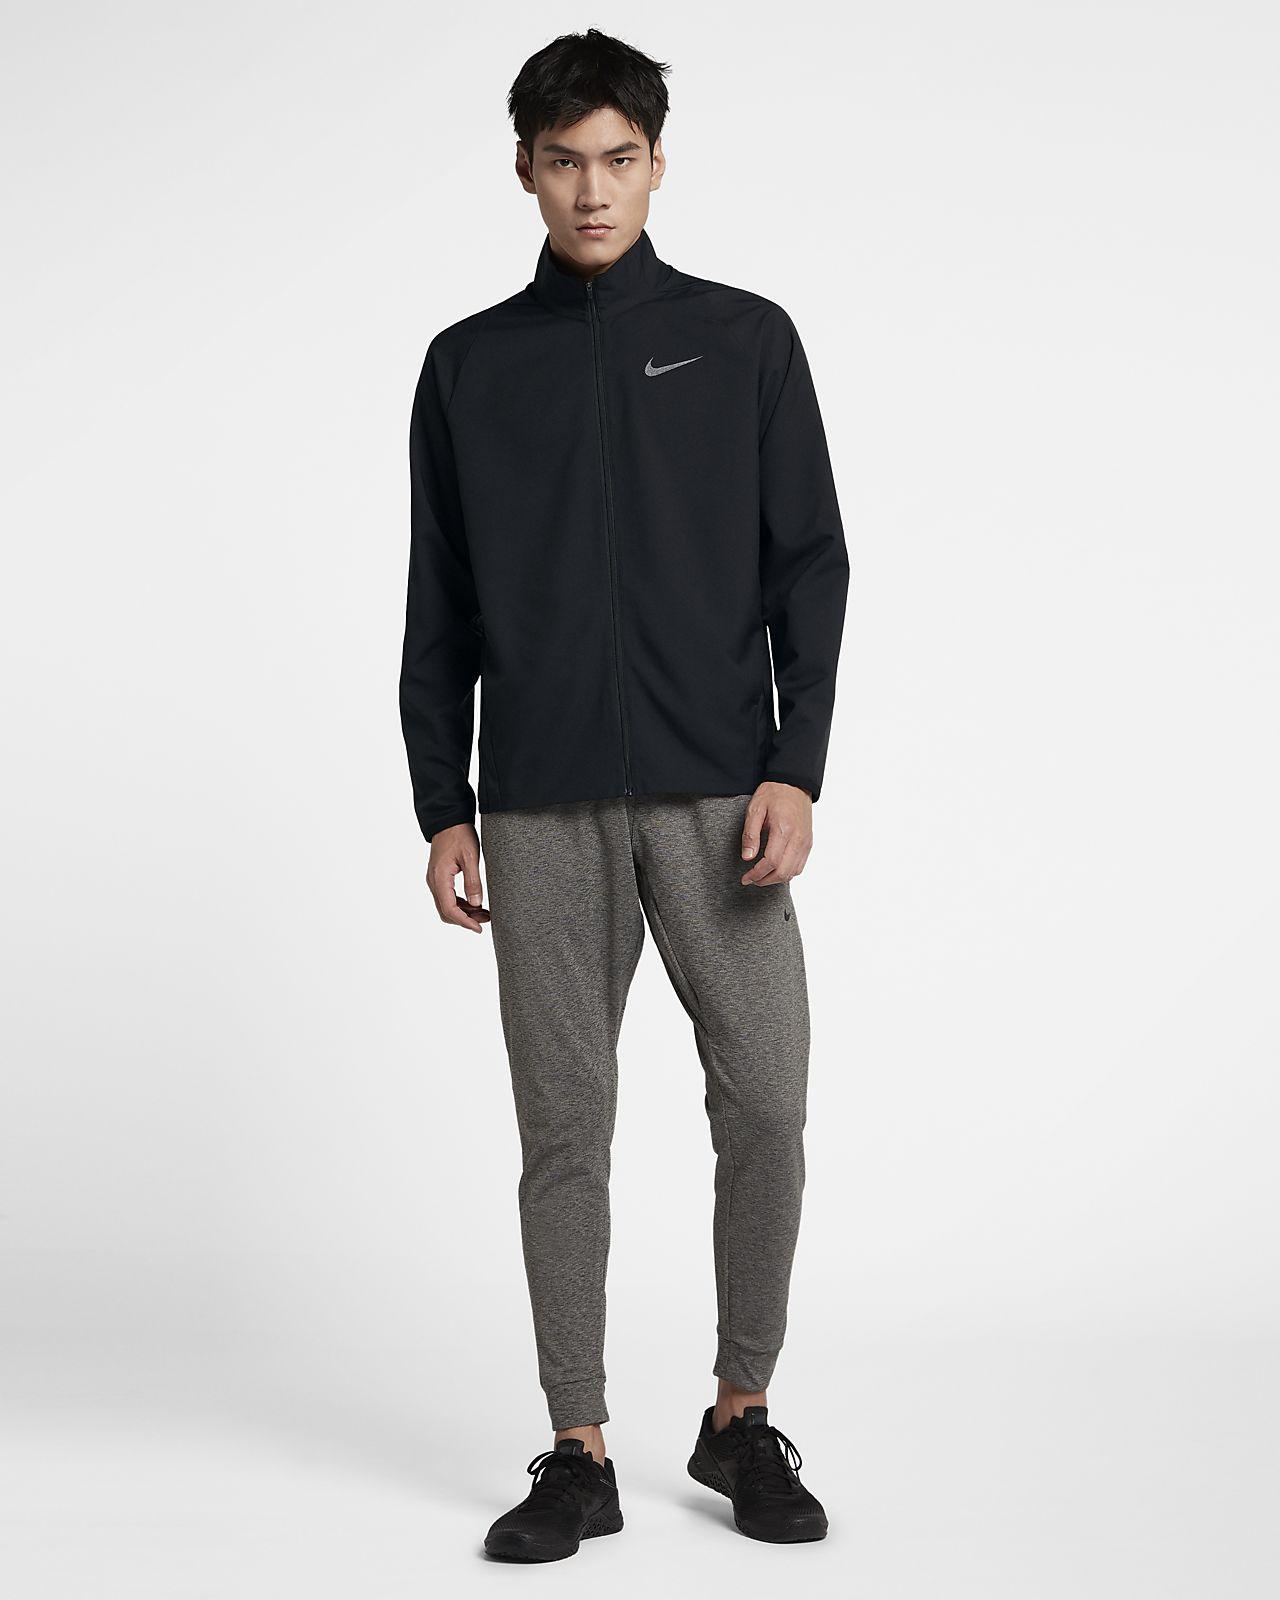 Nike Dri FIT Geweven trainingsjack voor heren. Nike NL